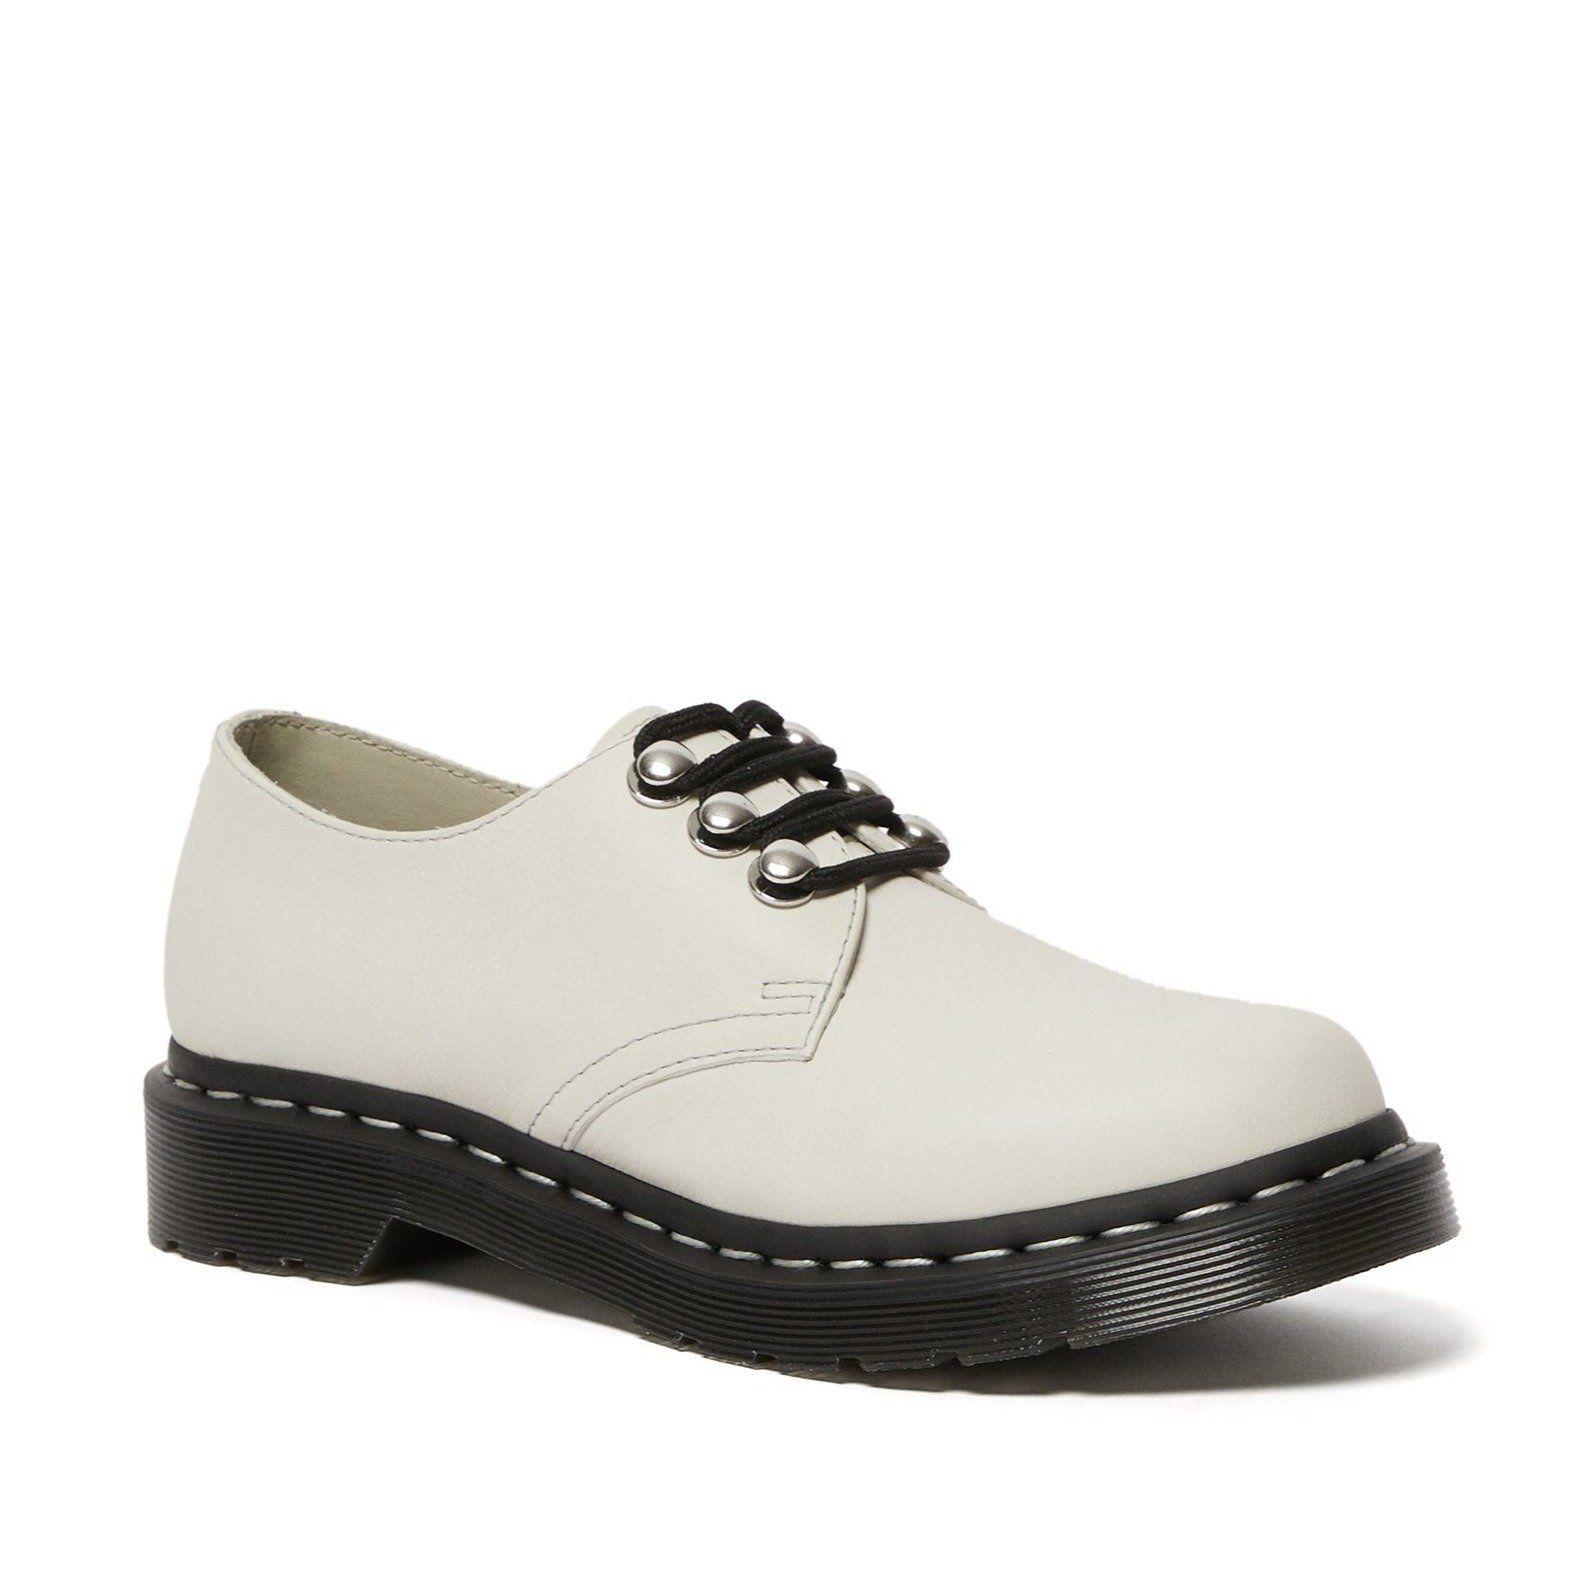 1461 Dr. Merten's Hardware Leather Oxford Shoe – 6